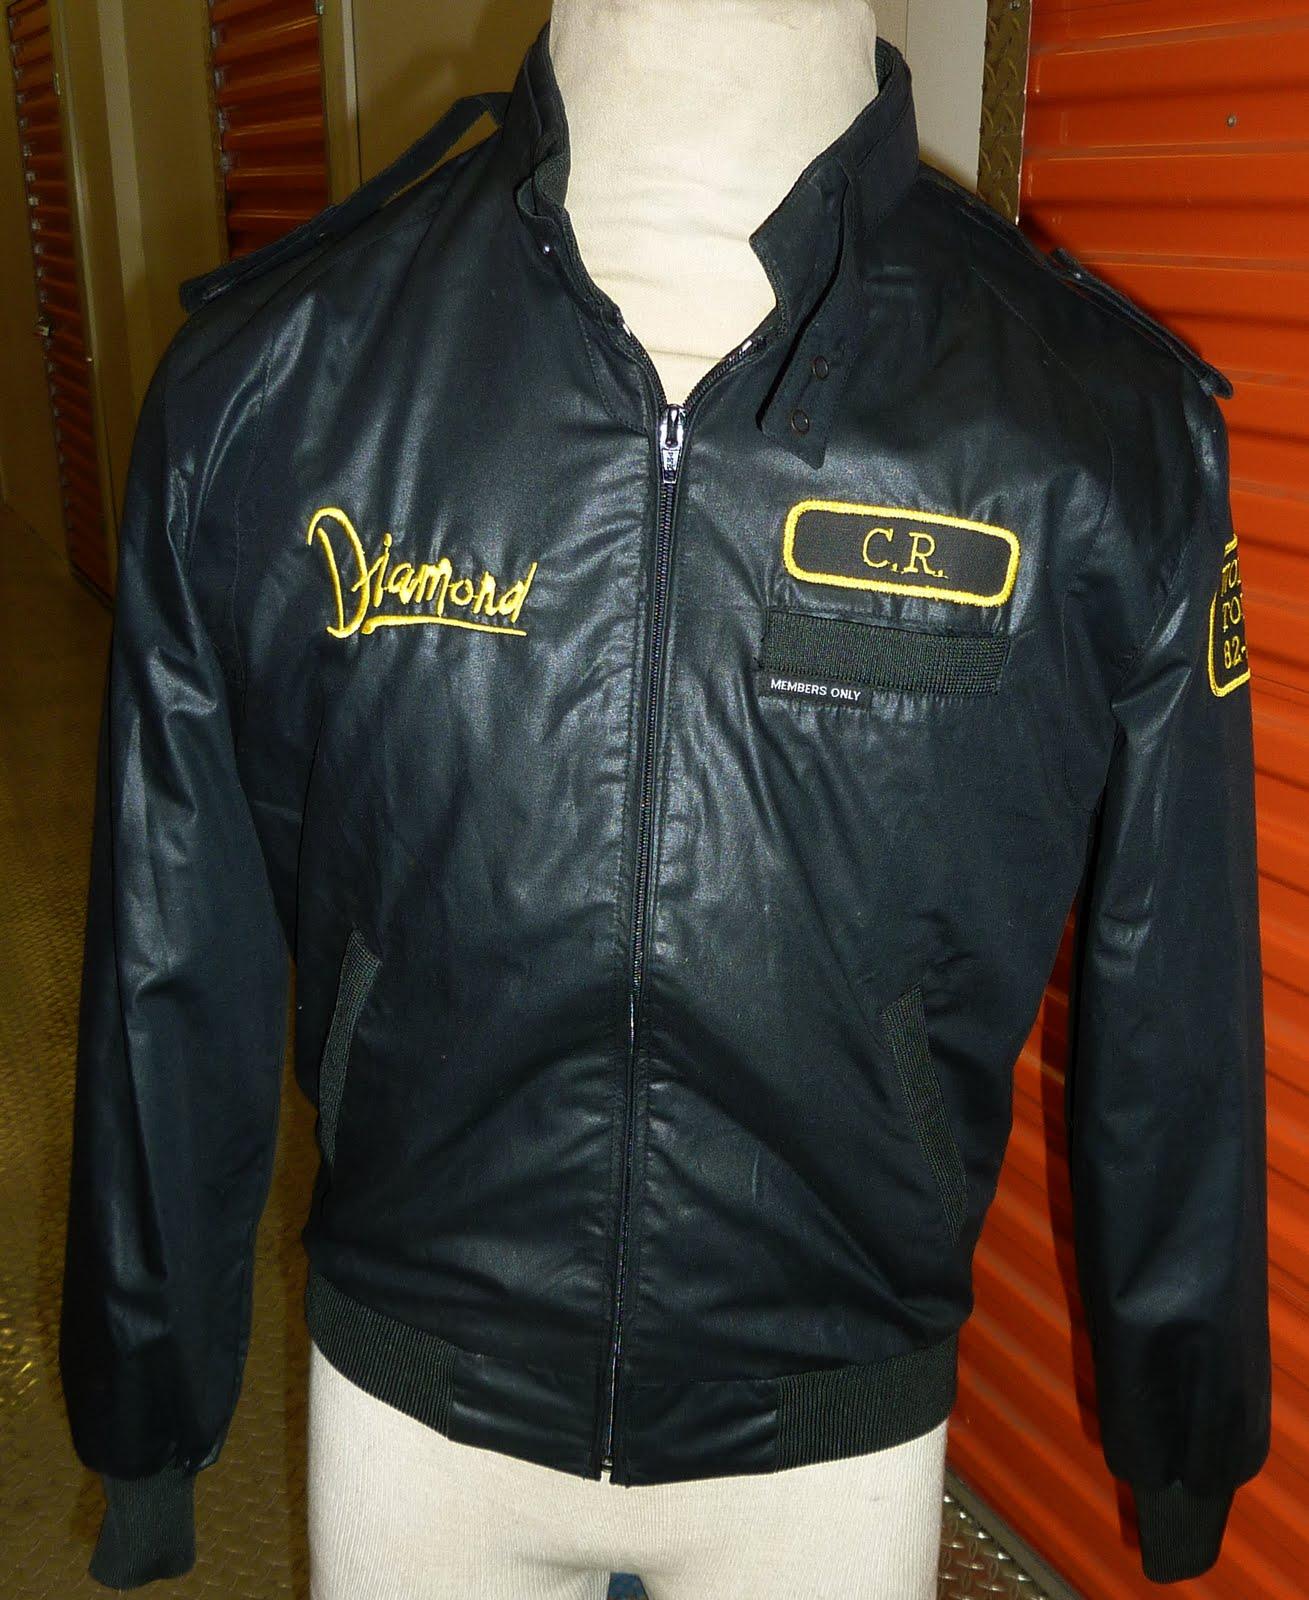 vintagetourjackets neil diamond members only 1982 83 tour jacket